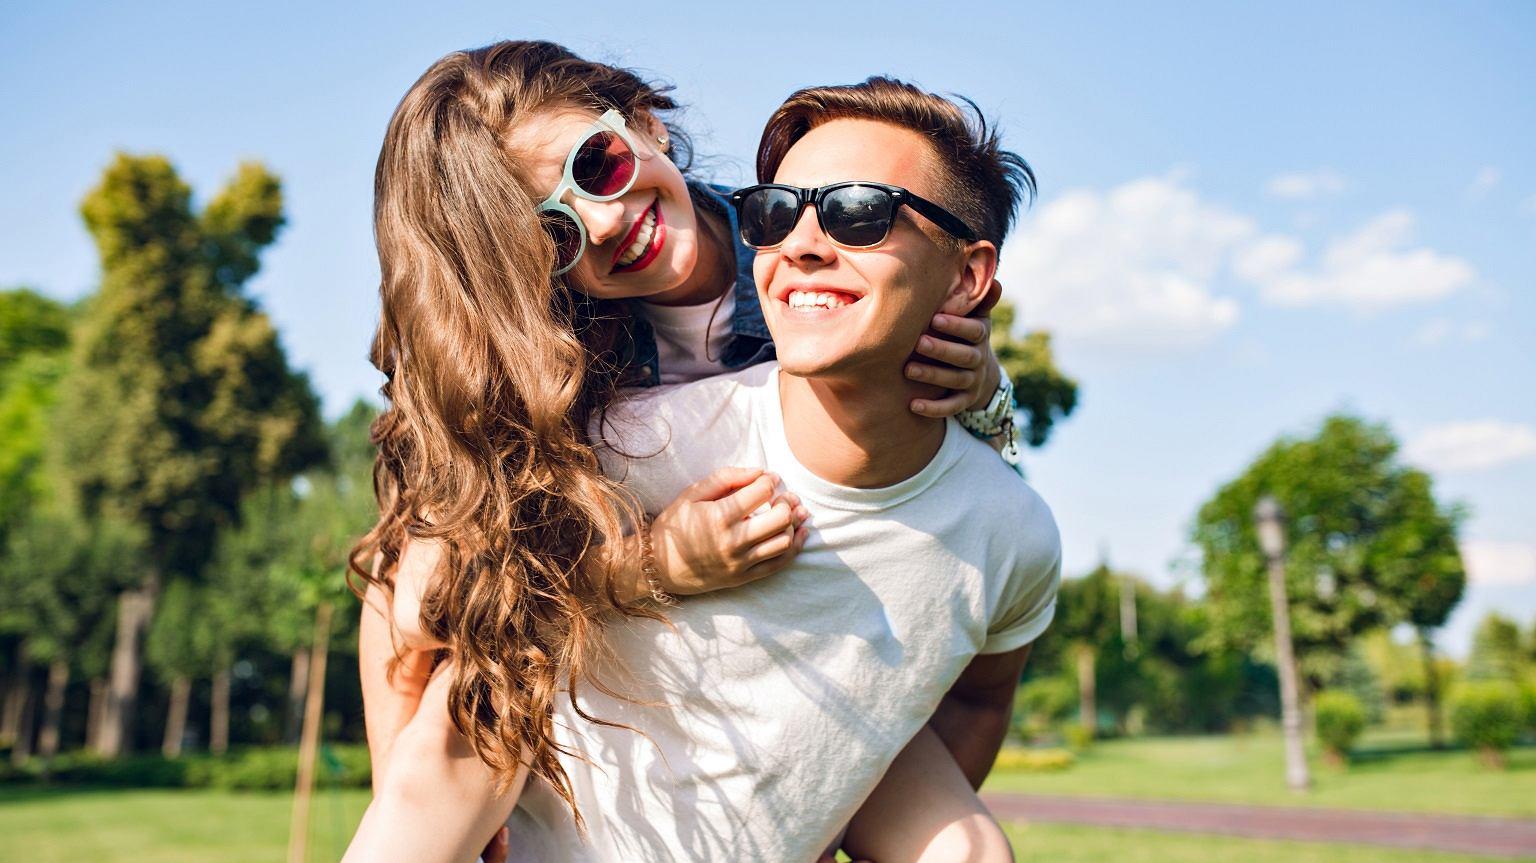 Serce serduszko online dating